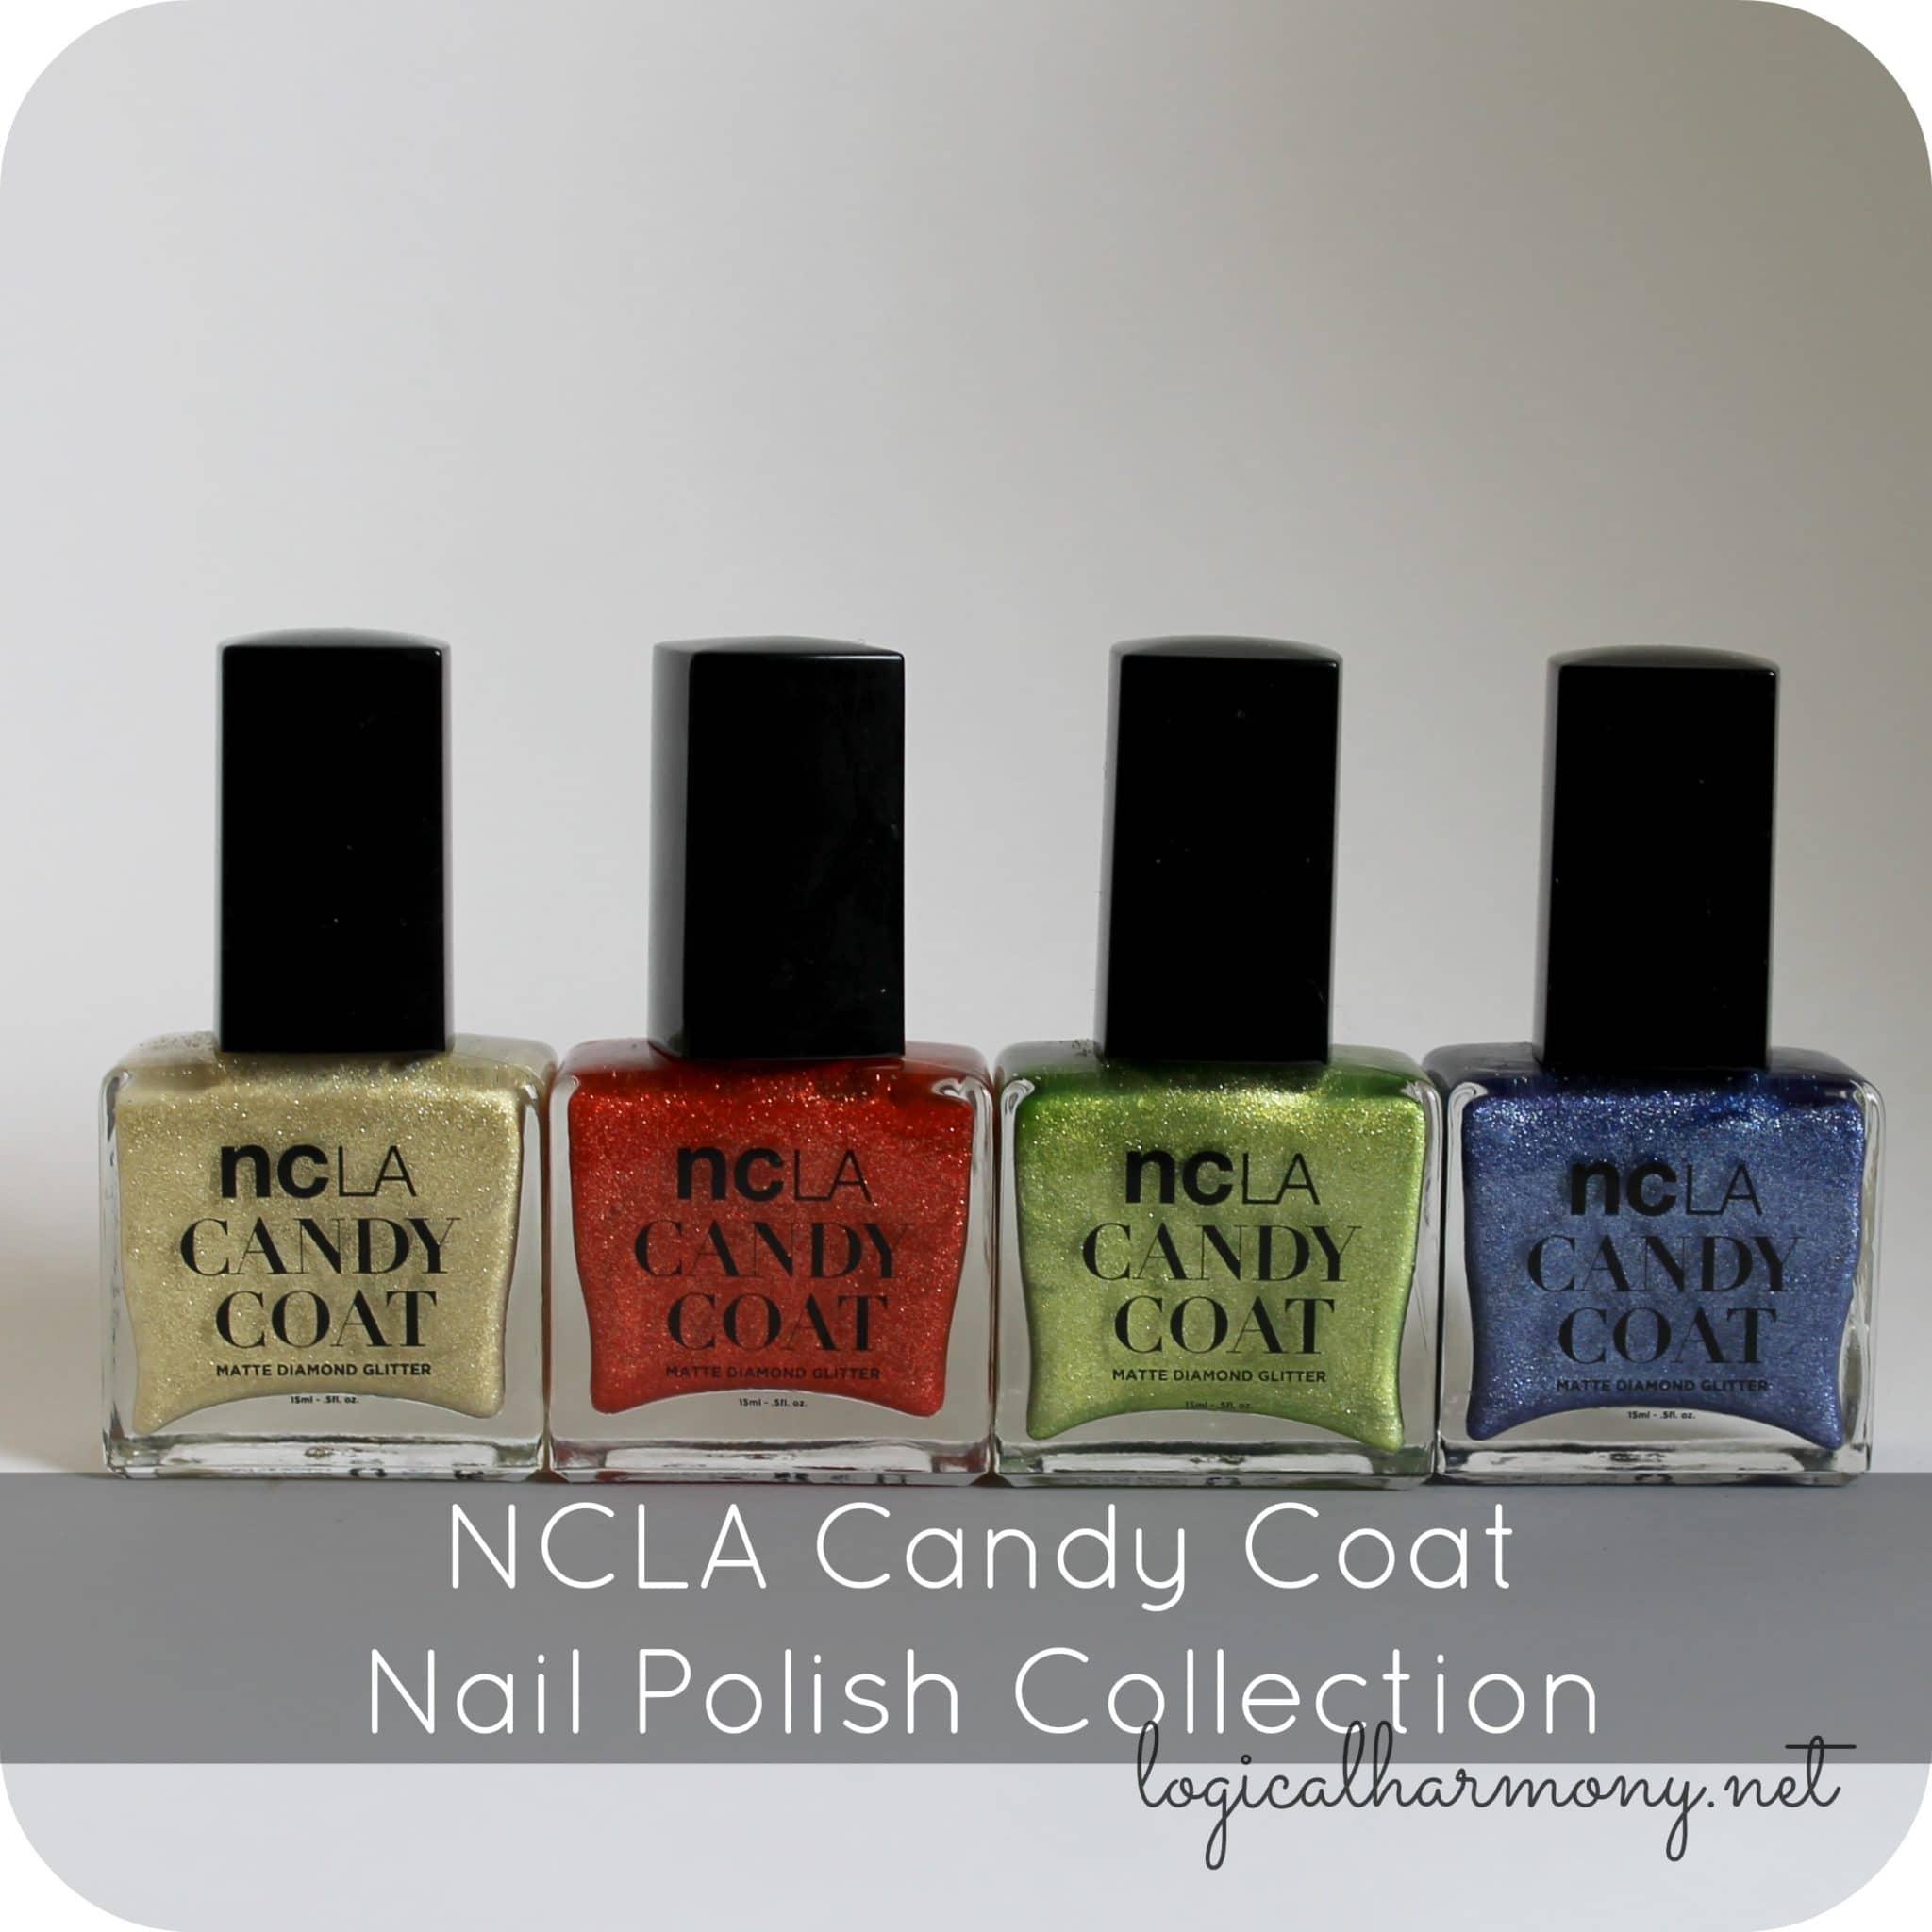 NCLA Candy Coat Nail Polish Collection